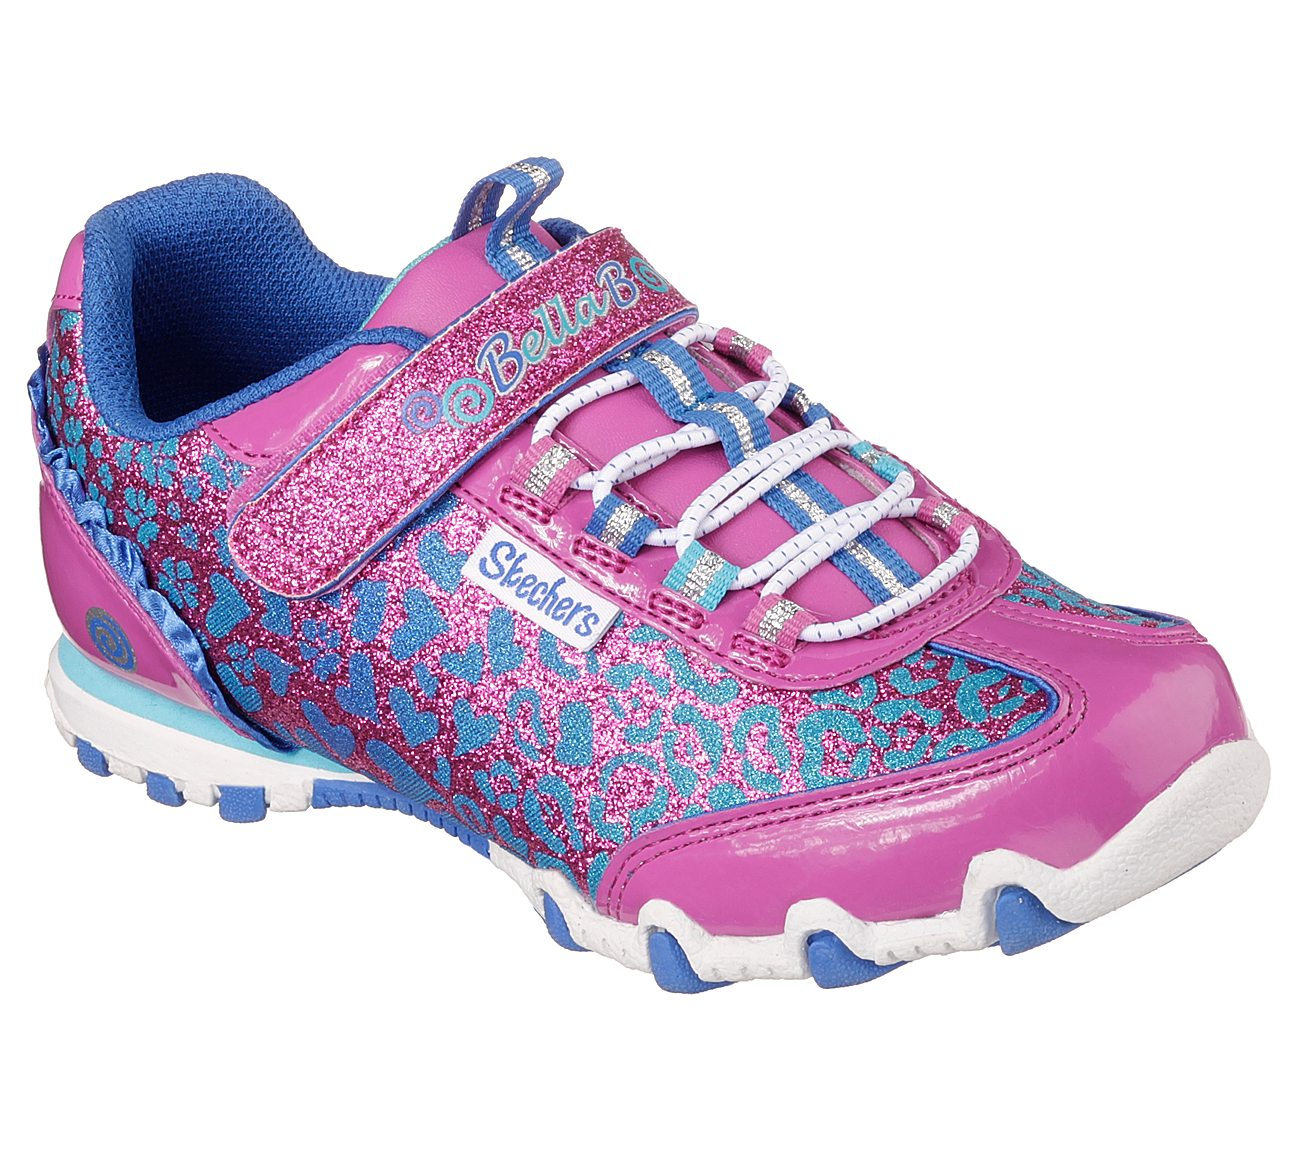 4c621d9dd00 Buy SKECHERS Bella Ballerina  Prima - Lil  Twister Sport Shoes only ...